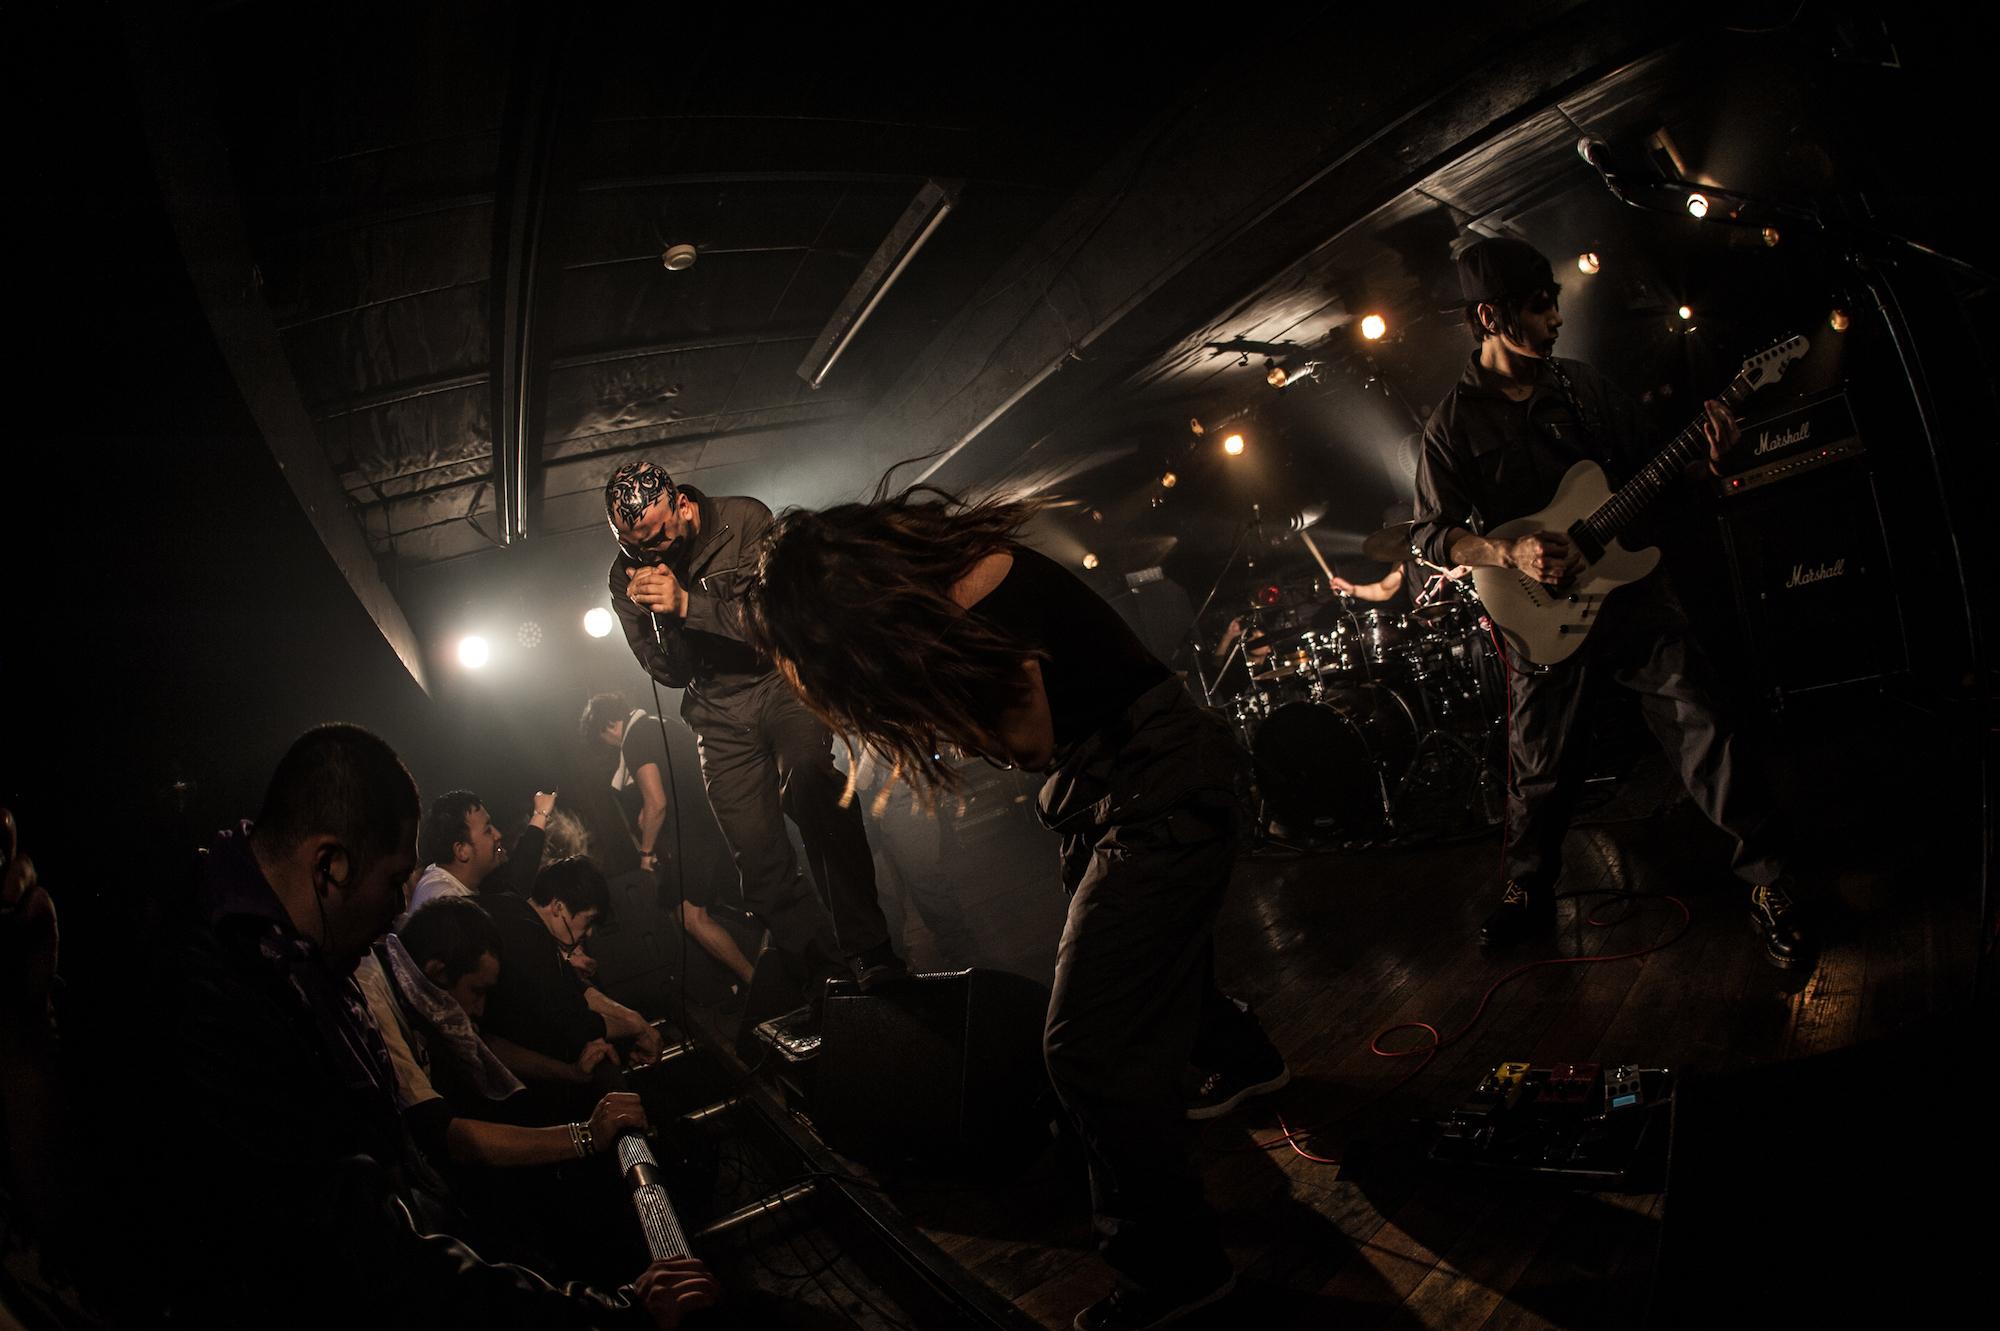 【UNDEAD CORPORATION】活動11周年記念!ミニアルバム制作プロジェクト!!